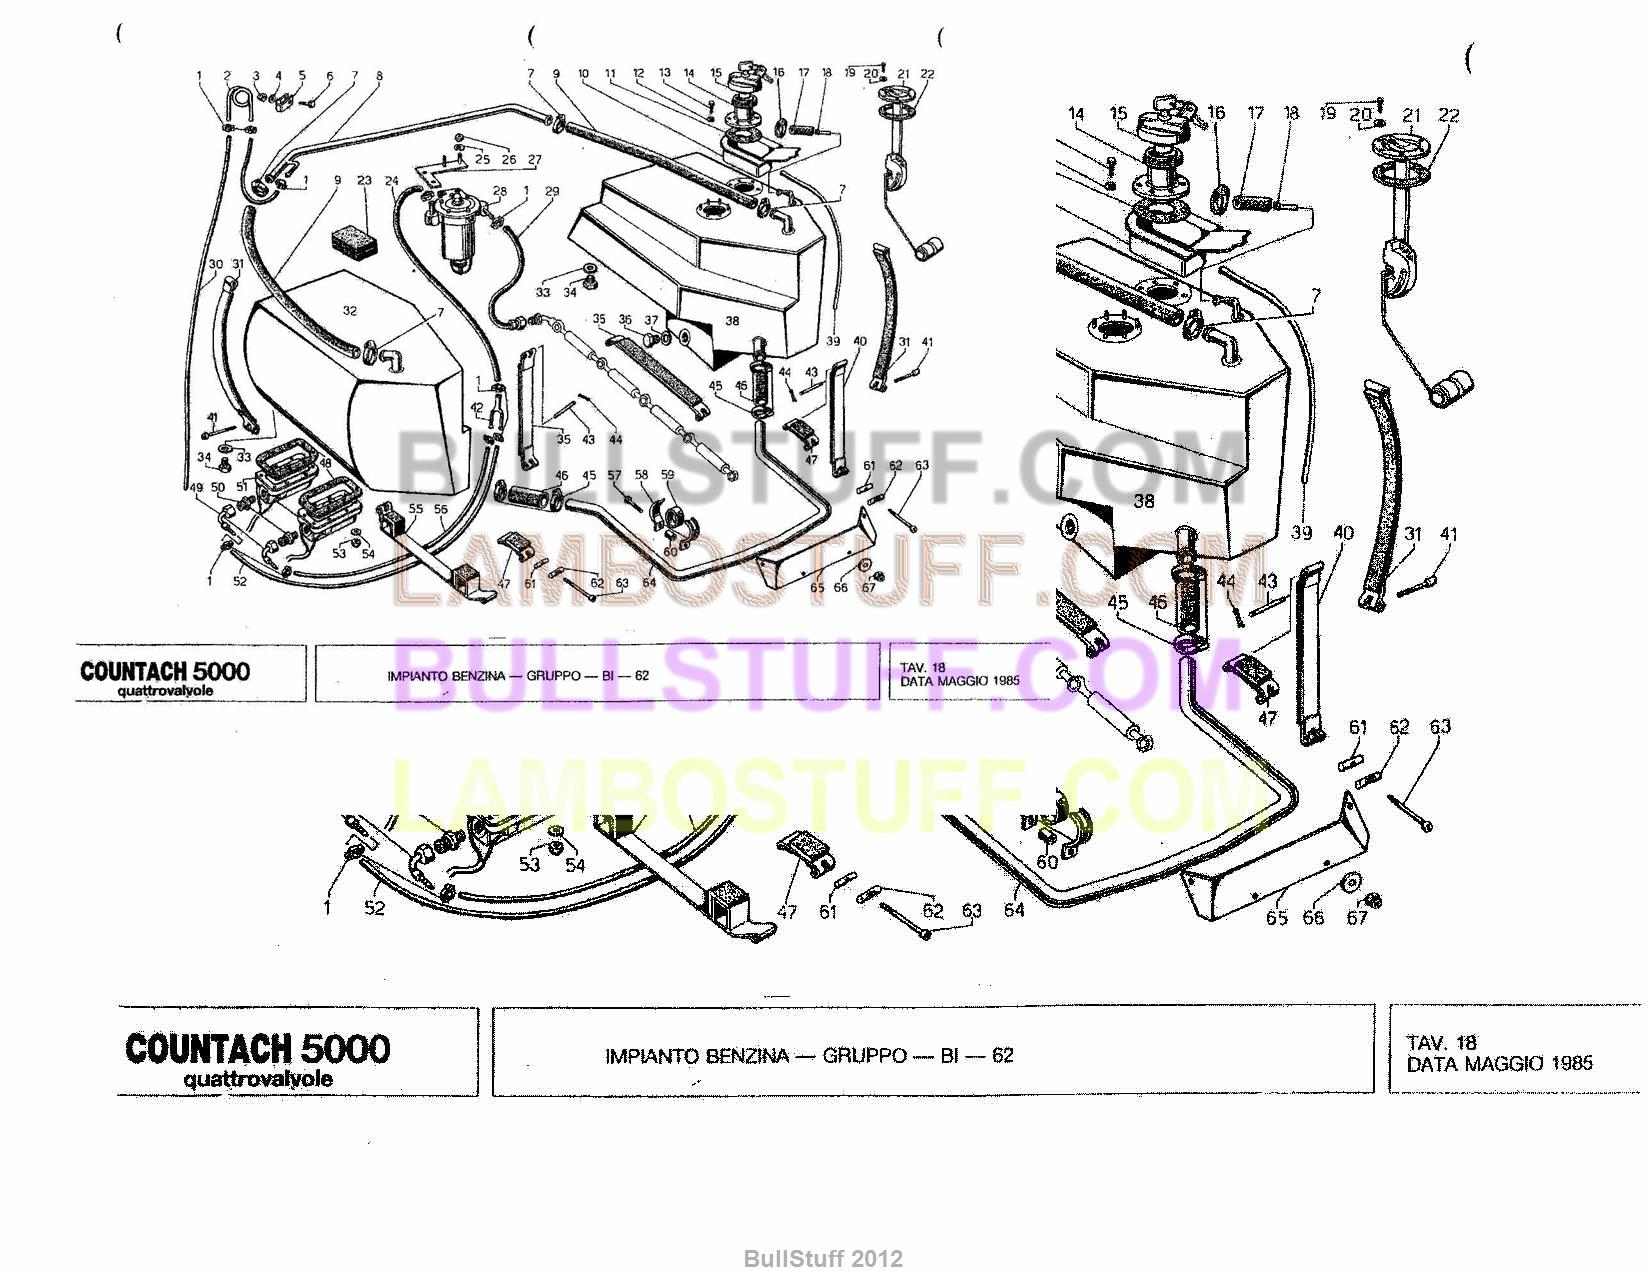 1985 Lamborghini Countach 5000 Quatro USA Fuel System 18 BullStuff – Lamborghini Countach Wiring Diagram